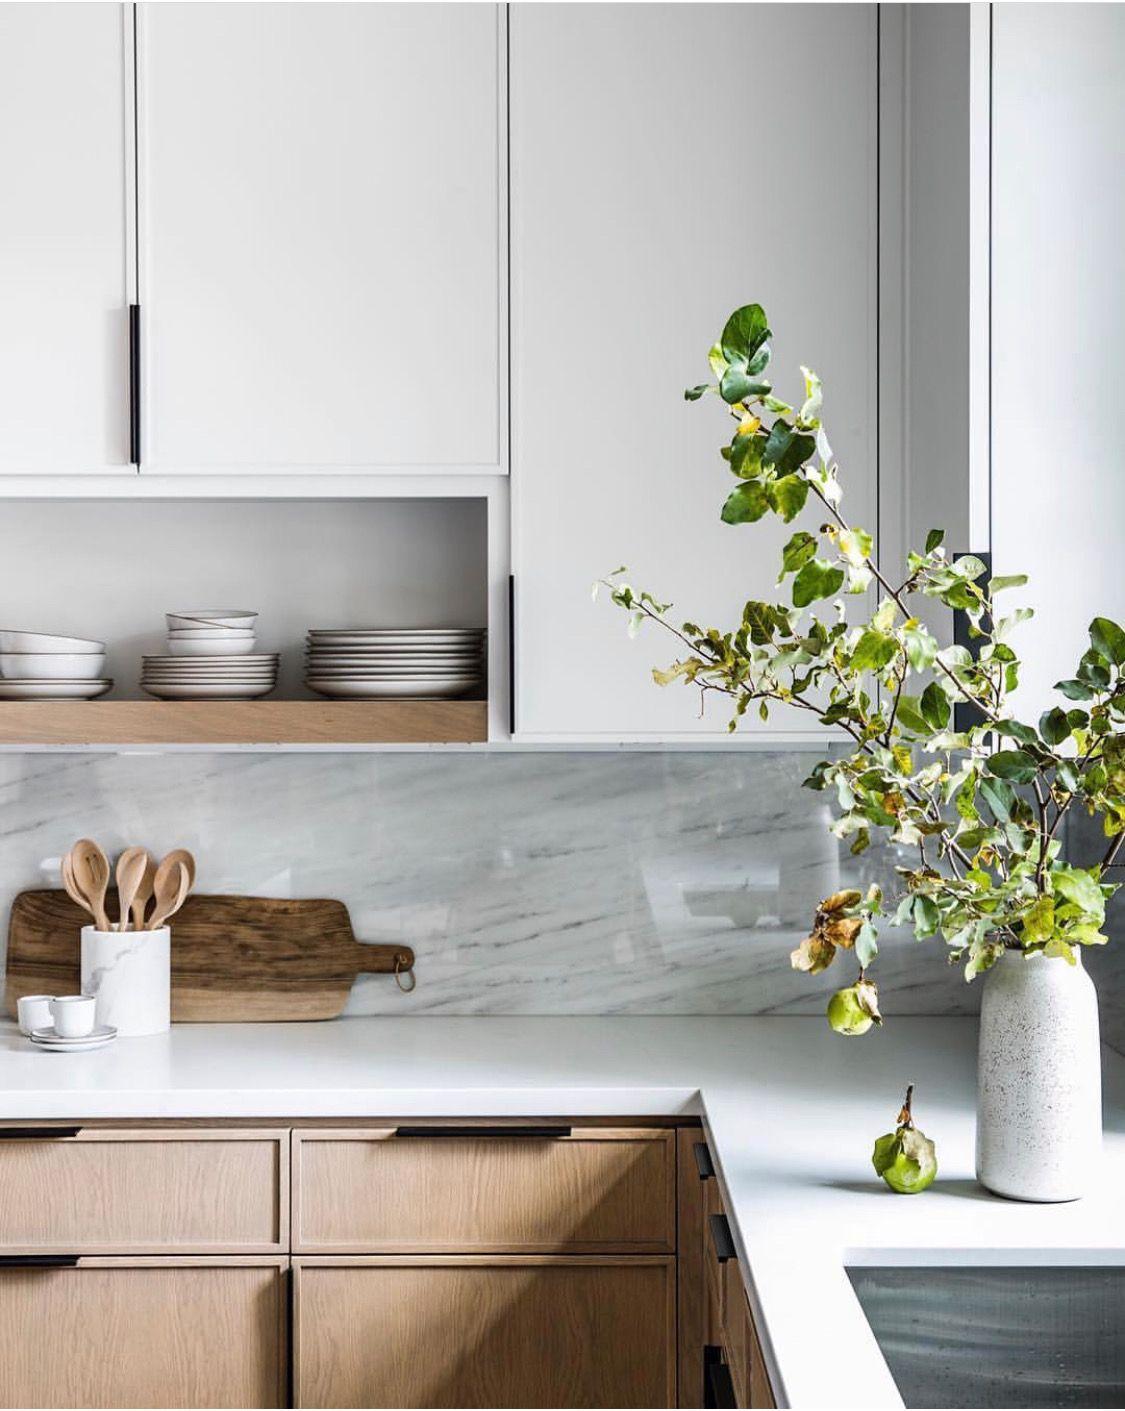 Extra Thin Shaker Kitchen Design Kitchen Inspirations Kitchen Interior